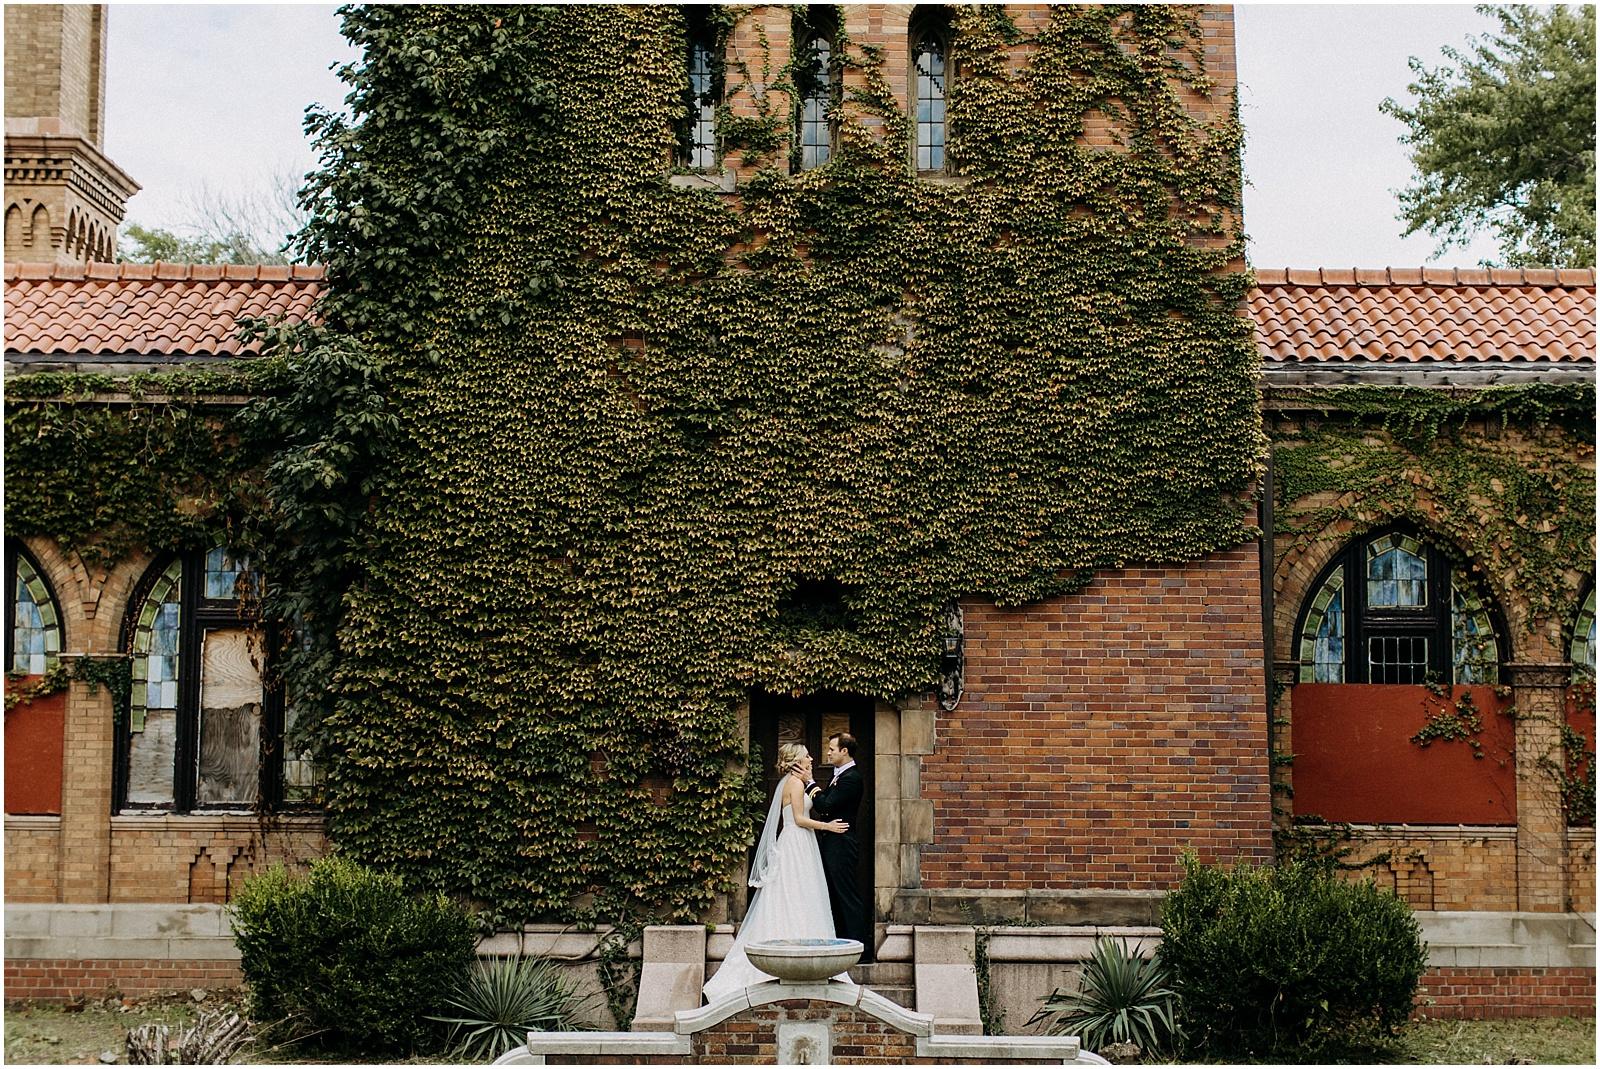 glen_echo_st_louis_mo_wedding_0060.jpg